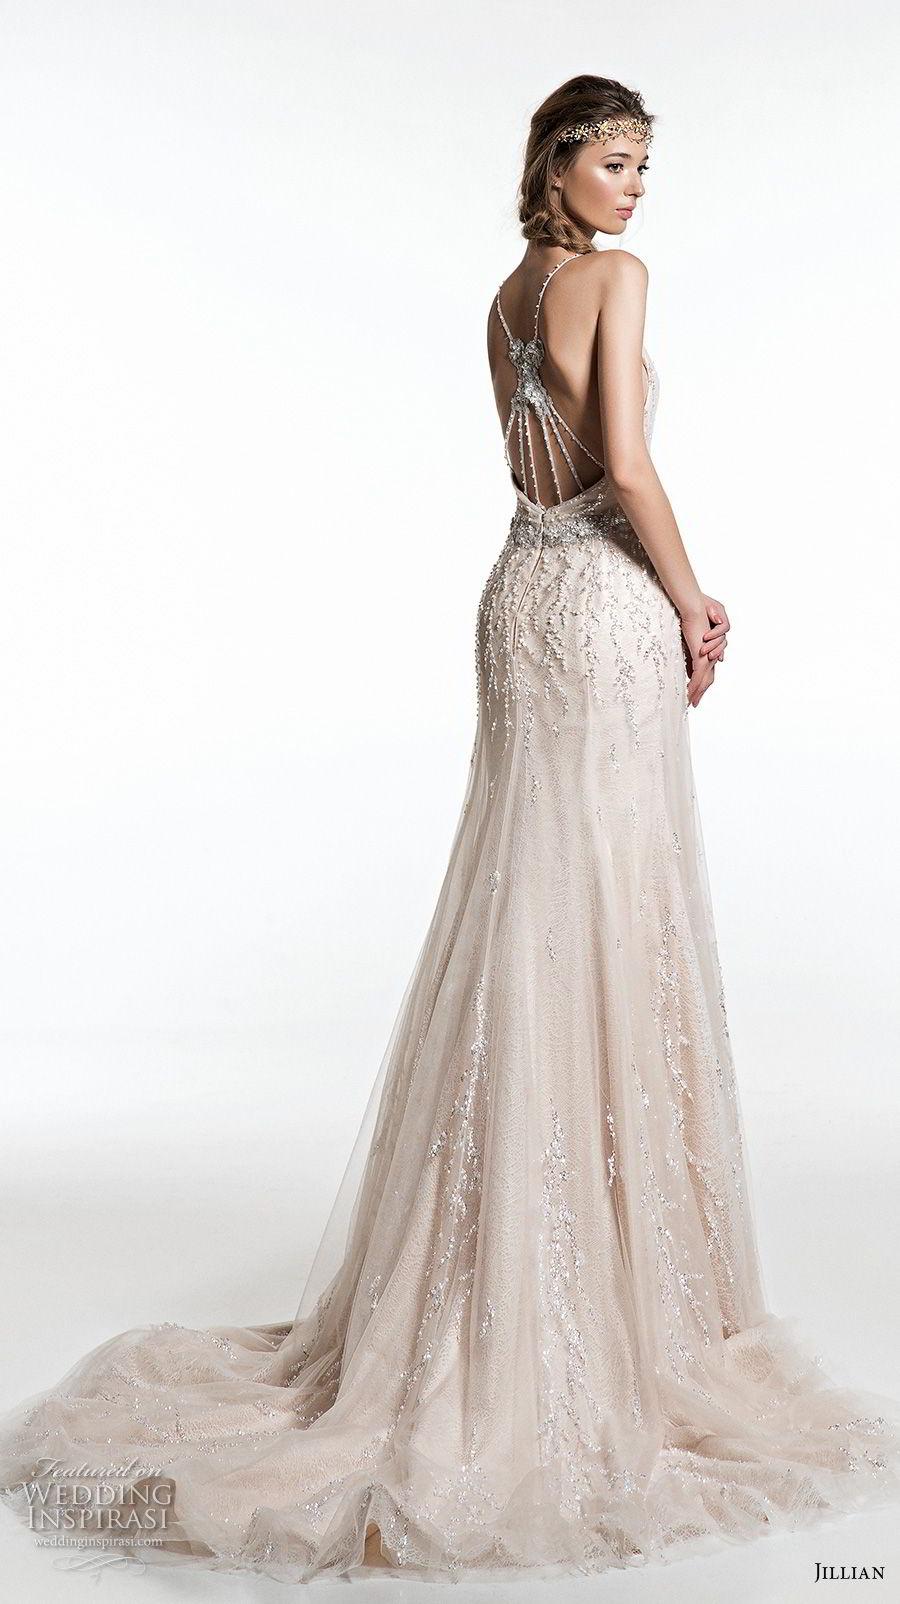 jillian 2019 bridal sleeveless with strap deep v neck full embellishment elegant glitzy champagne modified a  line wedding dress razor back medium train (14) bv